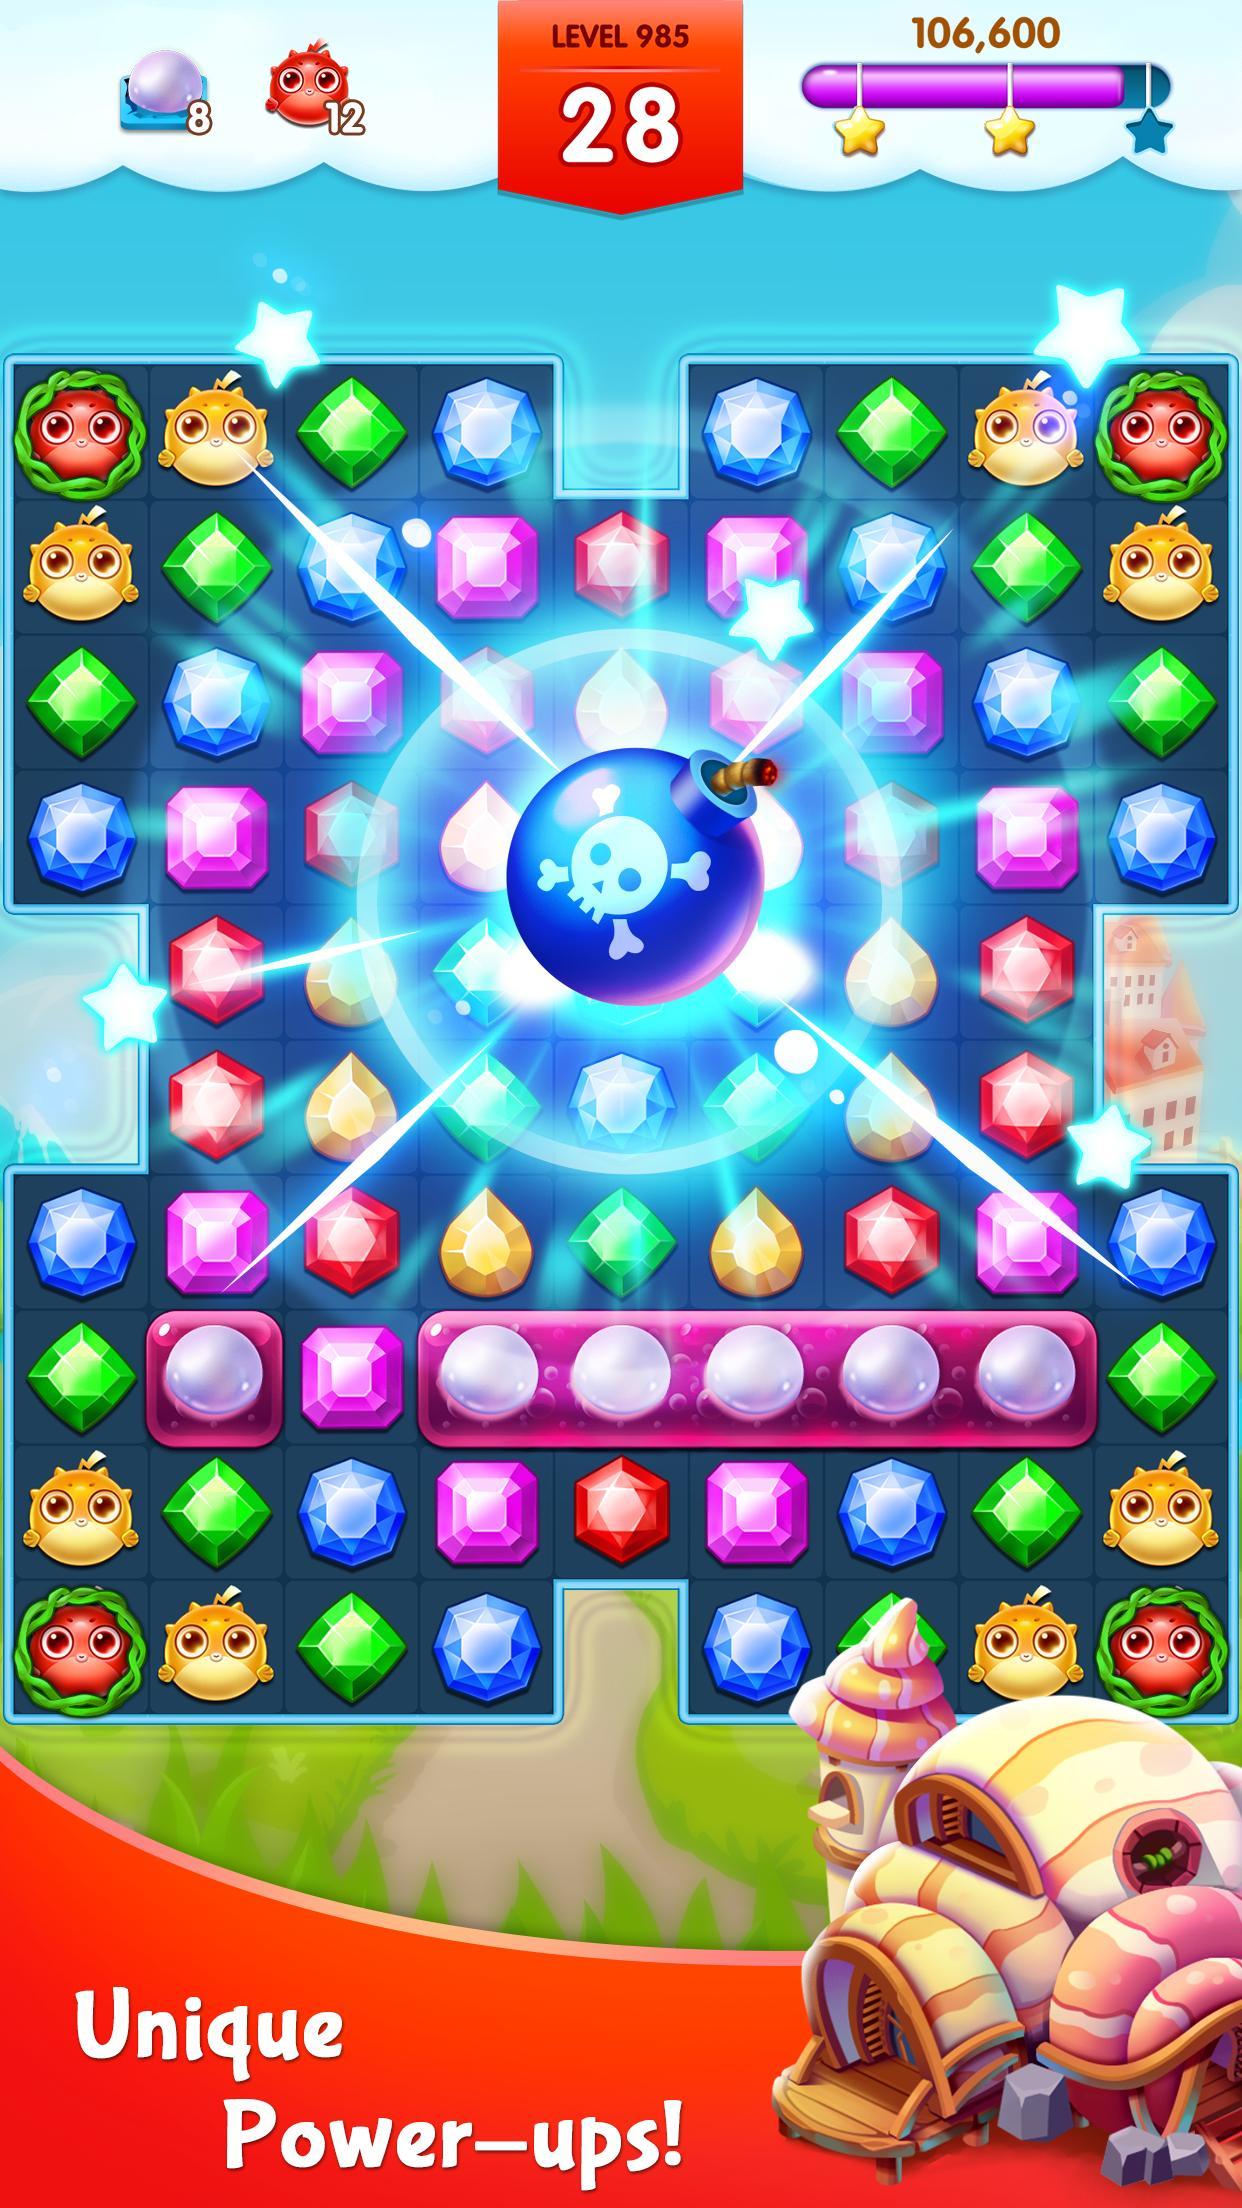 Jewels Legend - Match 3 Puzzle 2.33.3 Screenshot 4